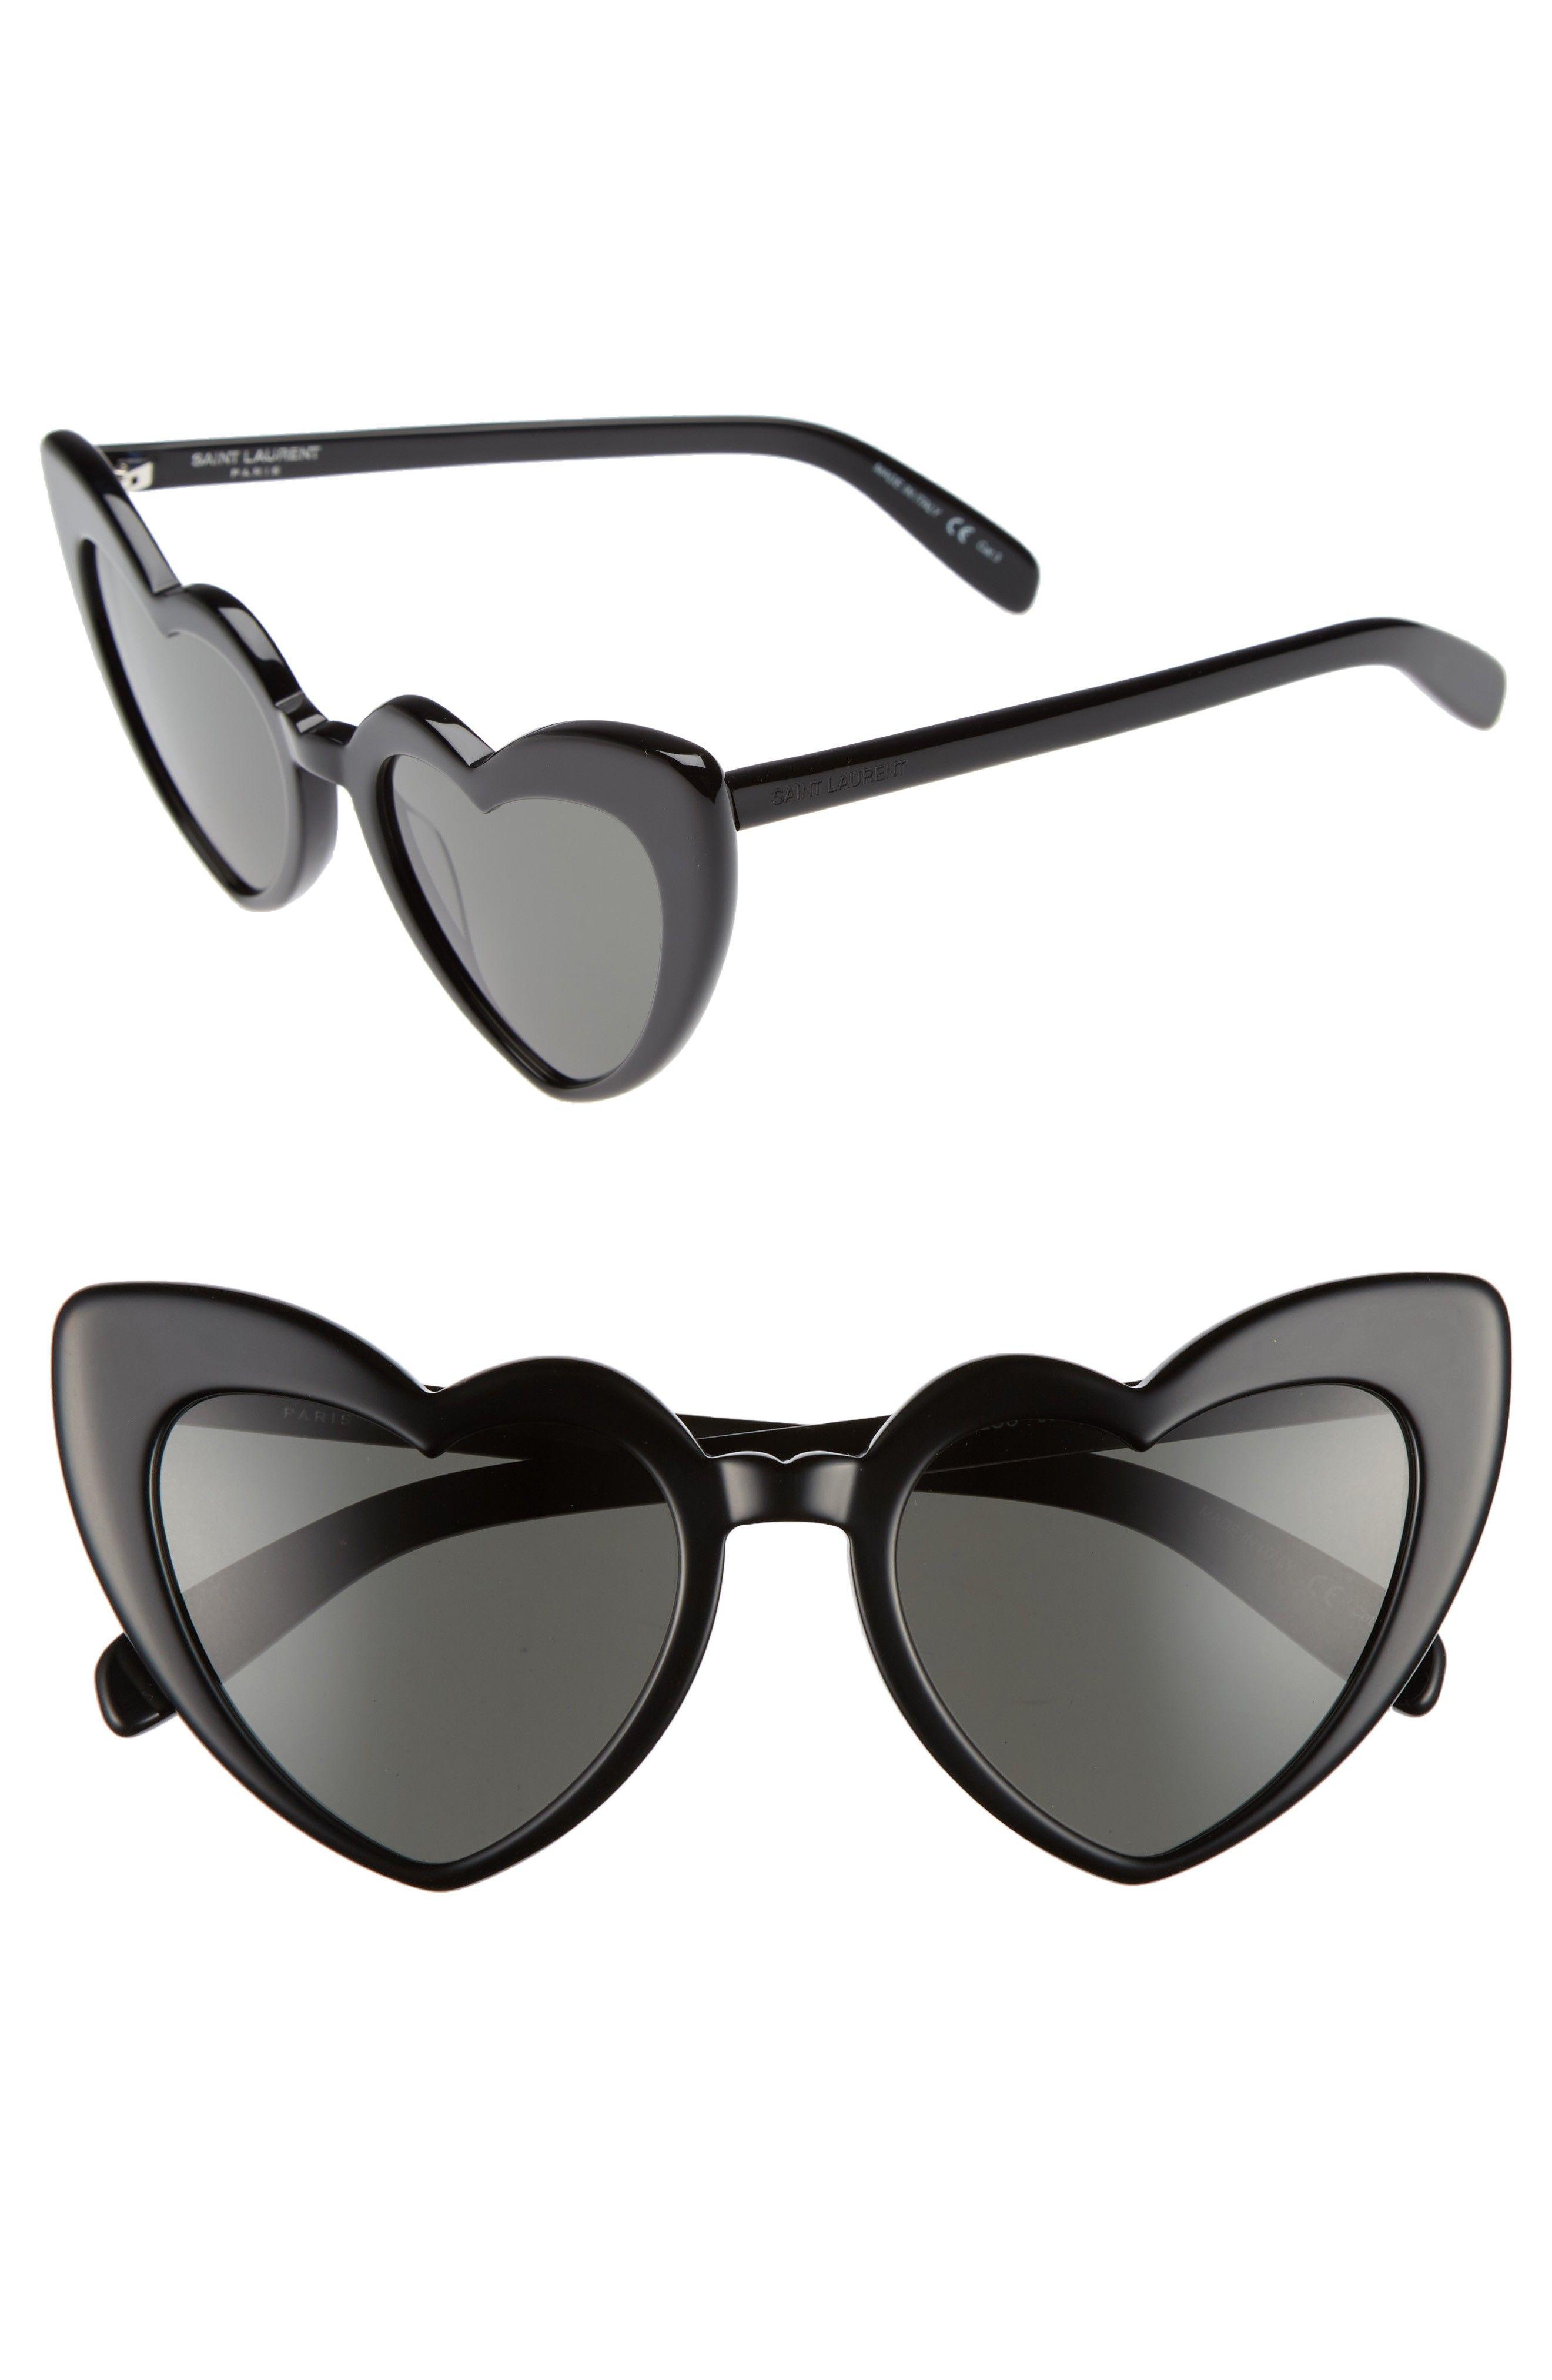 Loulou Heart Sunglasses, Saint Laurent #heartofgold...x